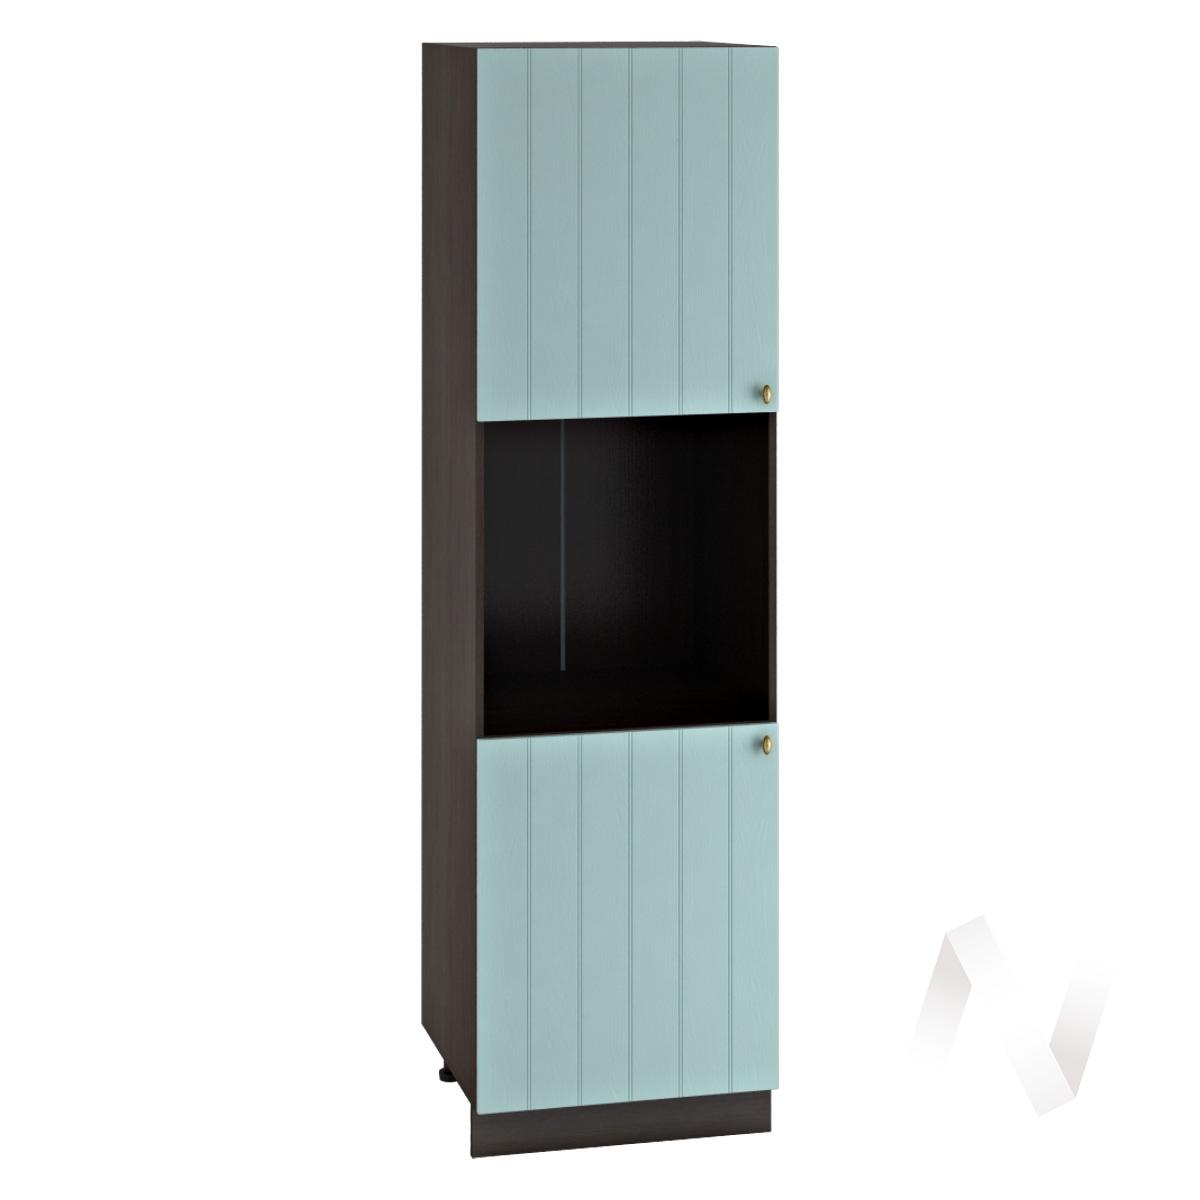 "Кухня ""Прованс"": Шкаф пенал 600, ШП 600 (голубой/корпус венге)"